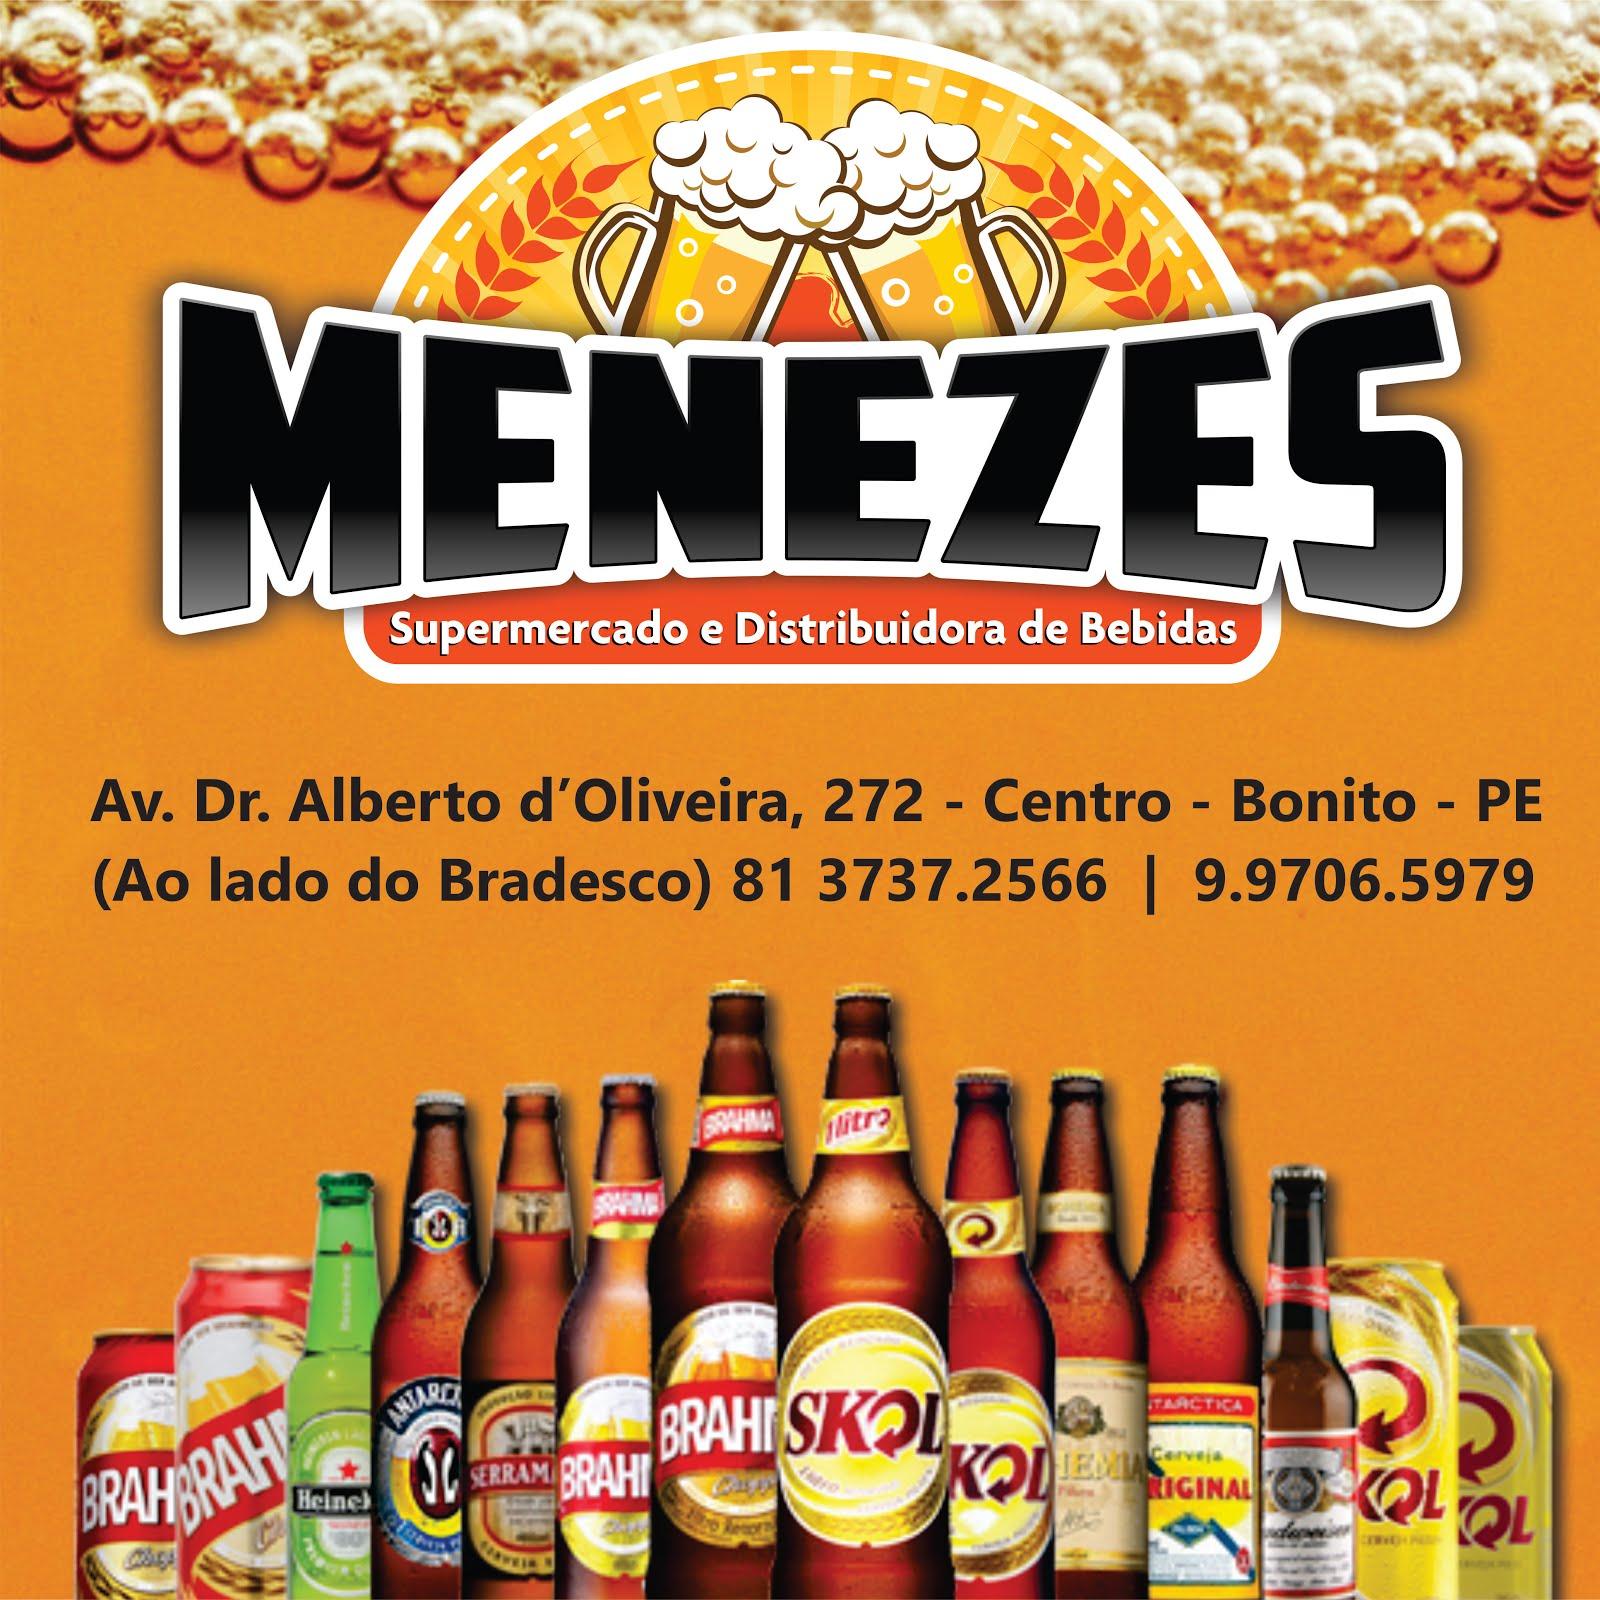 Menezes Distribuidora de Bebidas